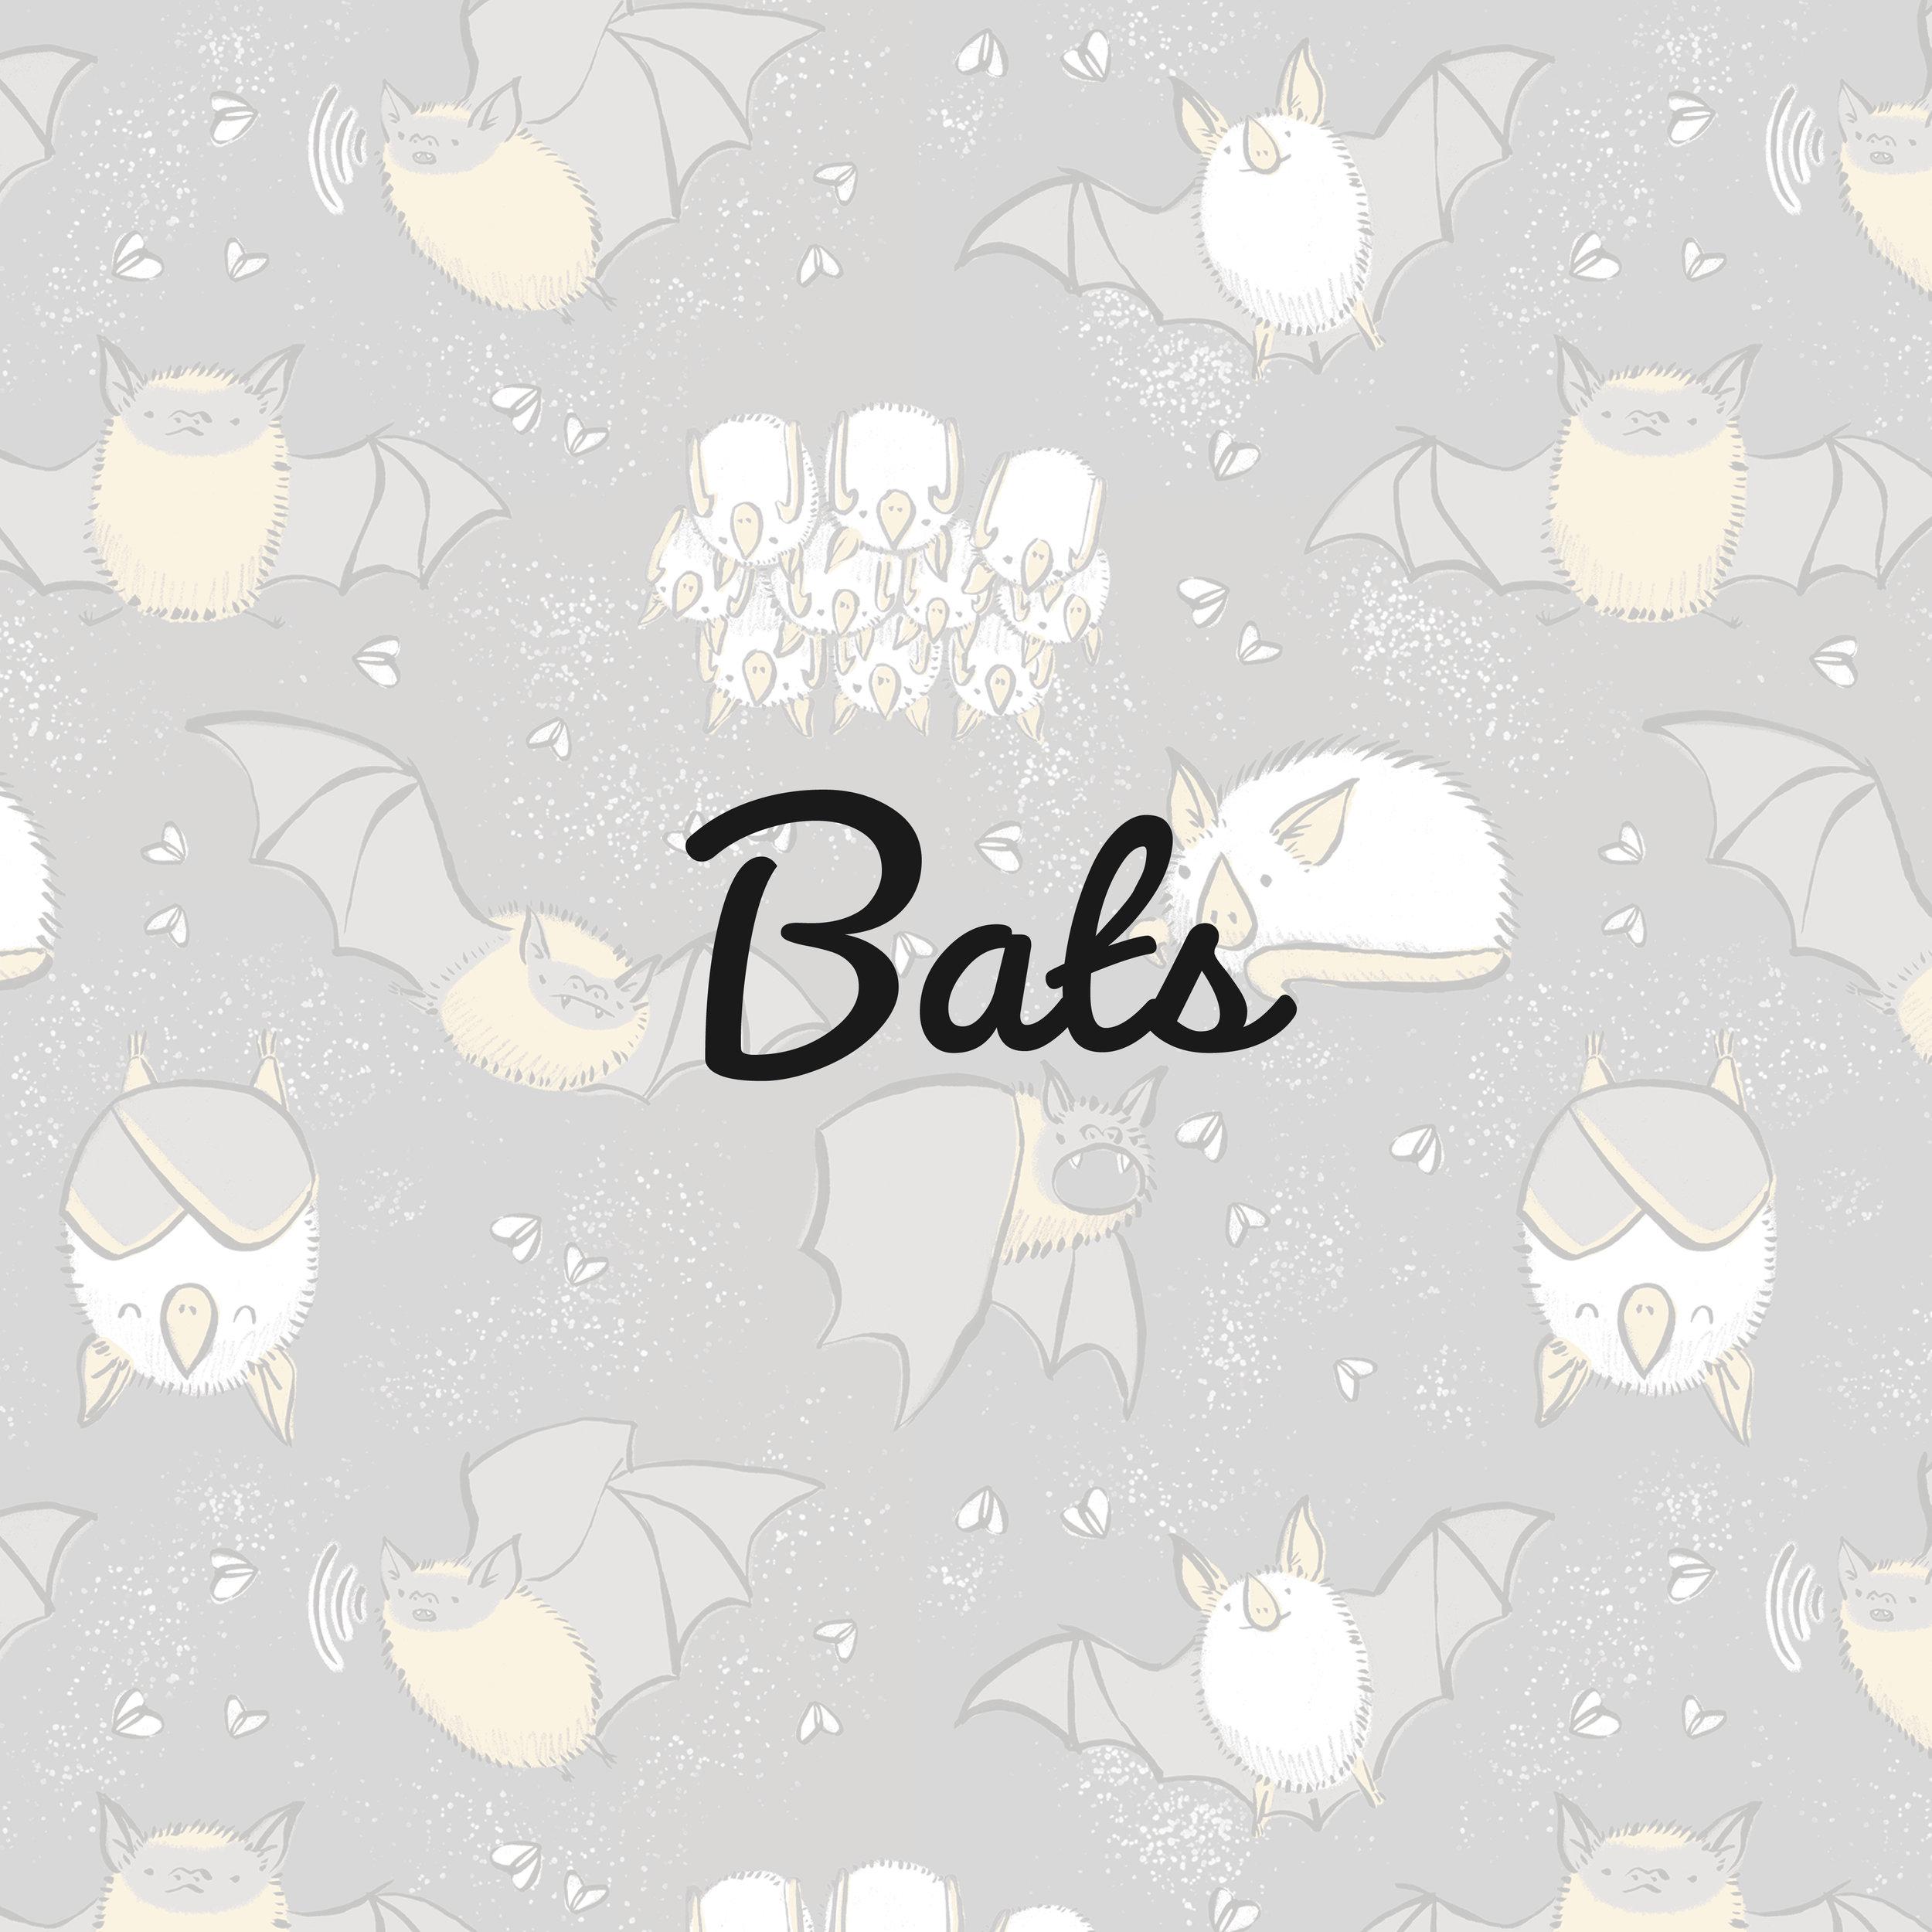 Bats_square.jpg